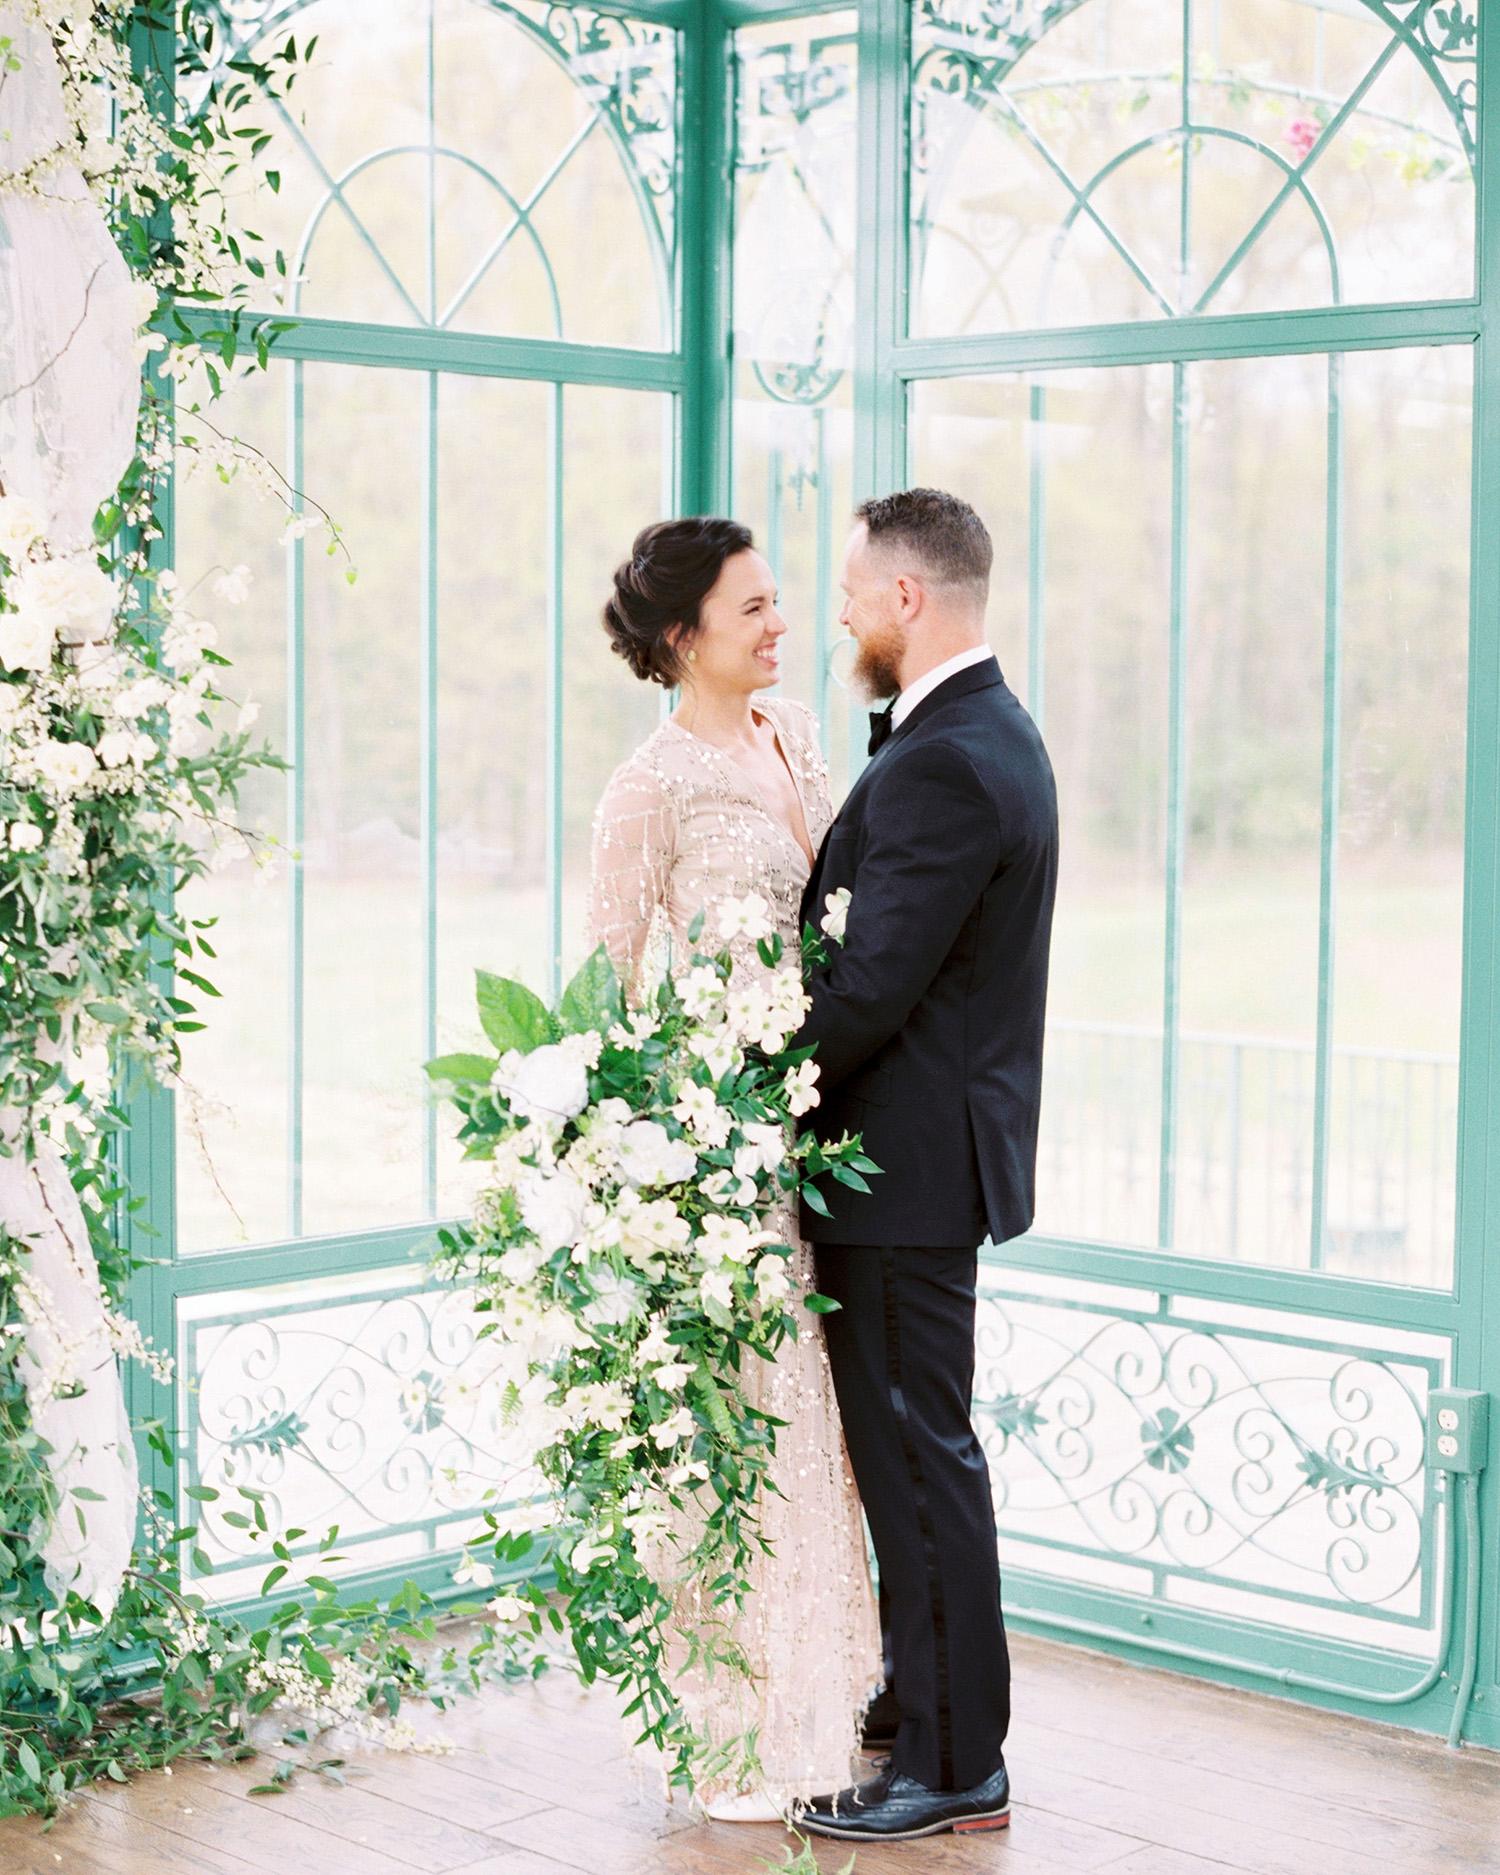 evan dustin vow renewal bride groom couple with bouquet